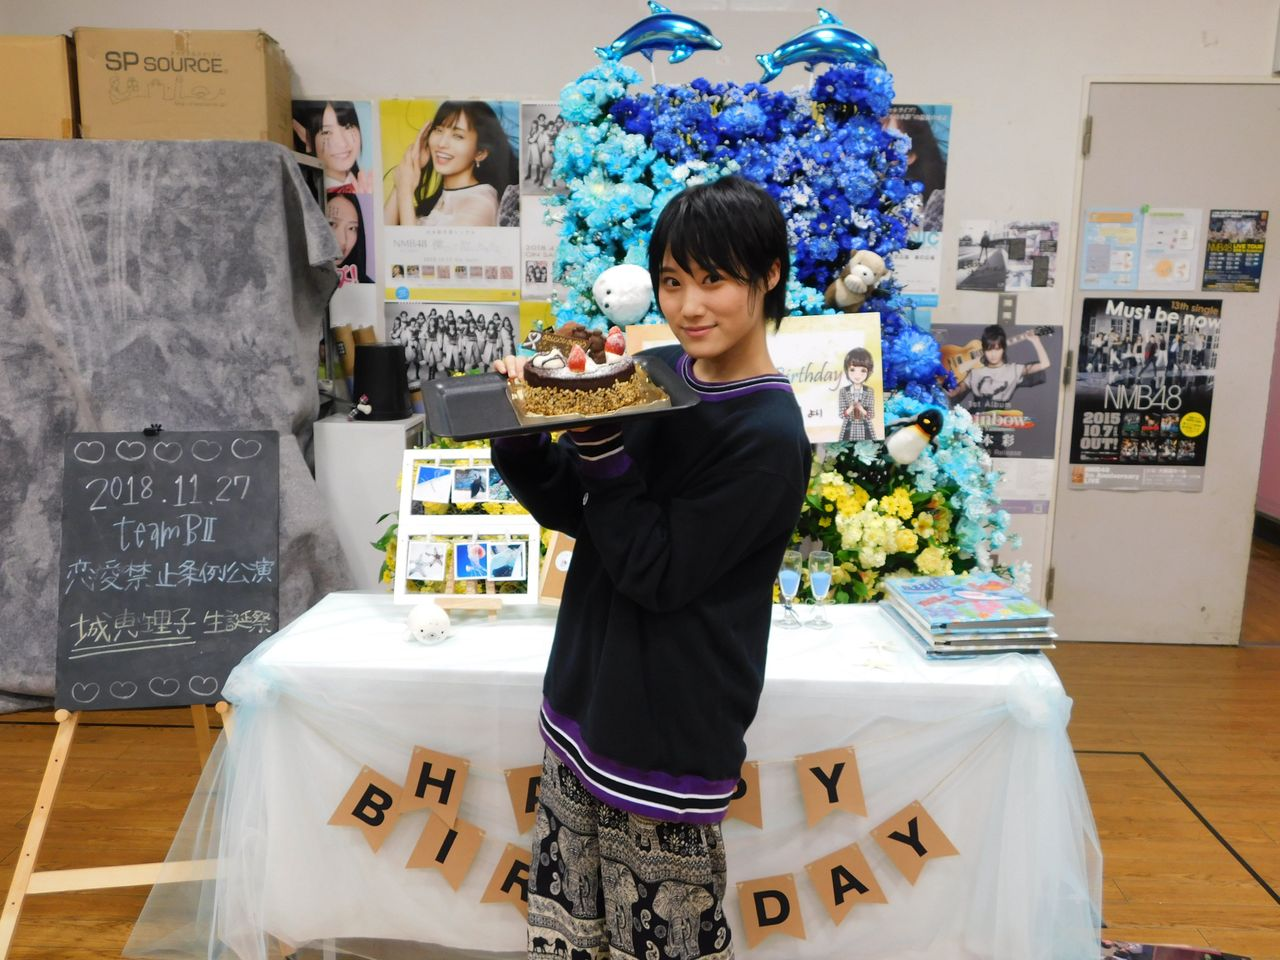 【NMB48】城恵理子生誕祭「後輩の育成、指導に力を注ぐ」